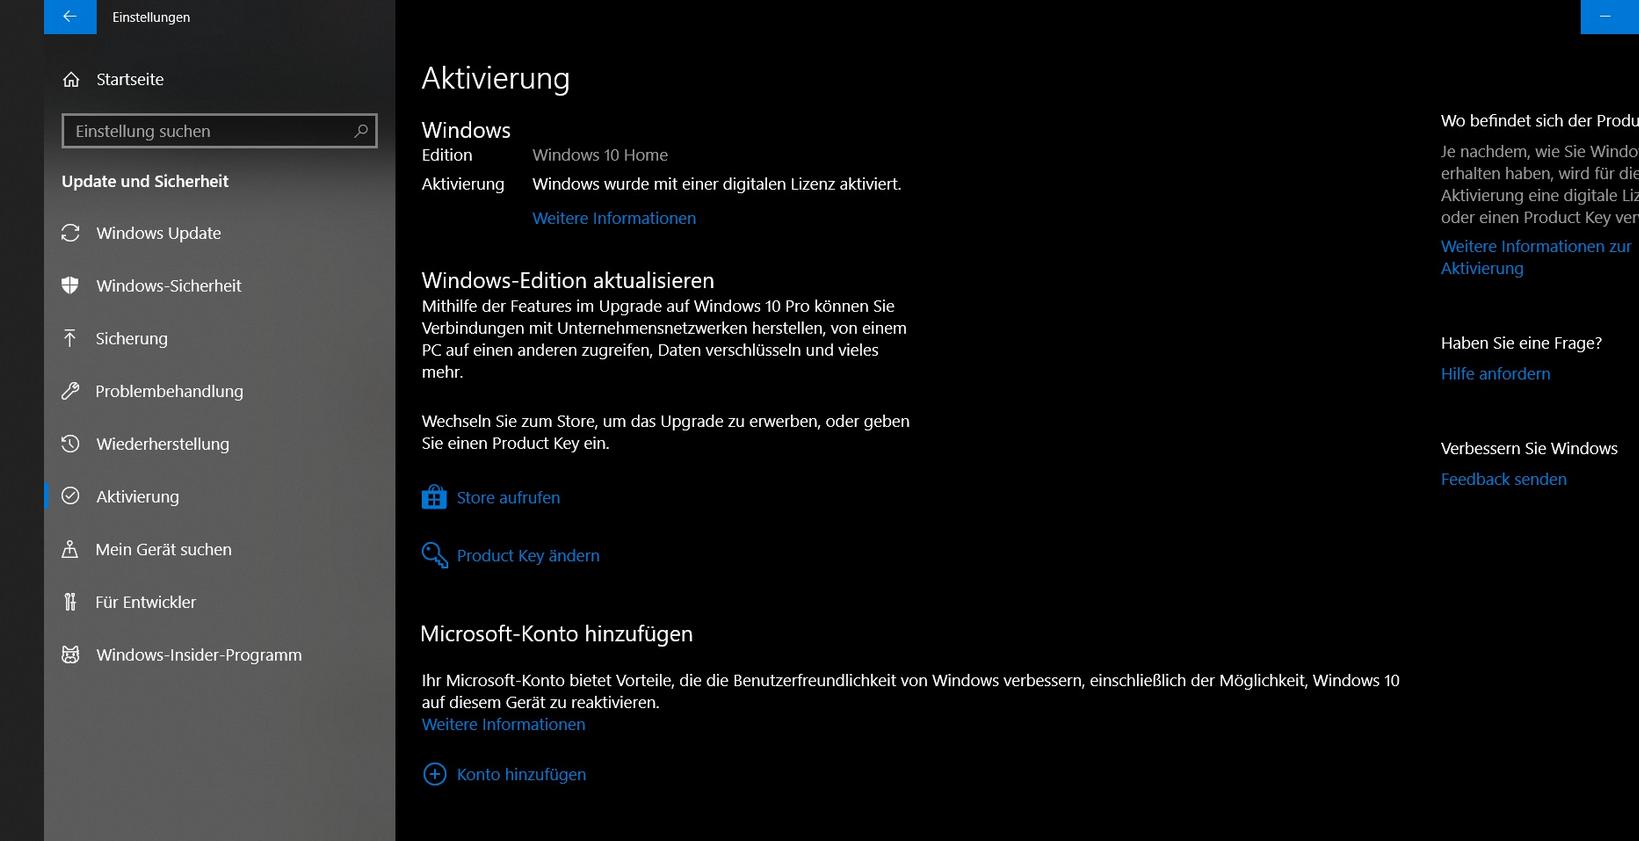 Upgrade auf Windows 10 Pro